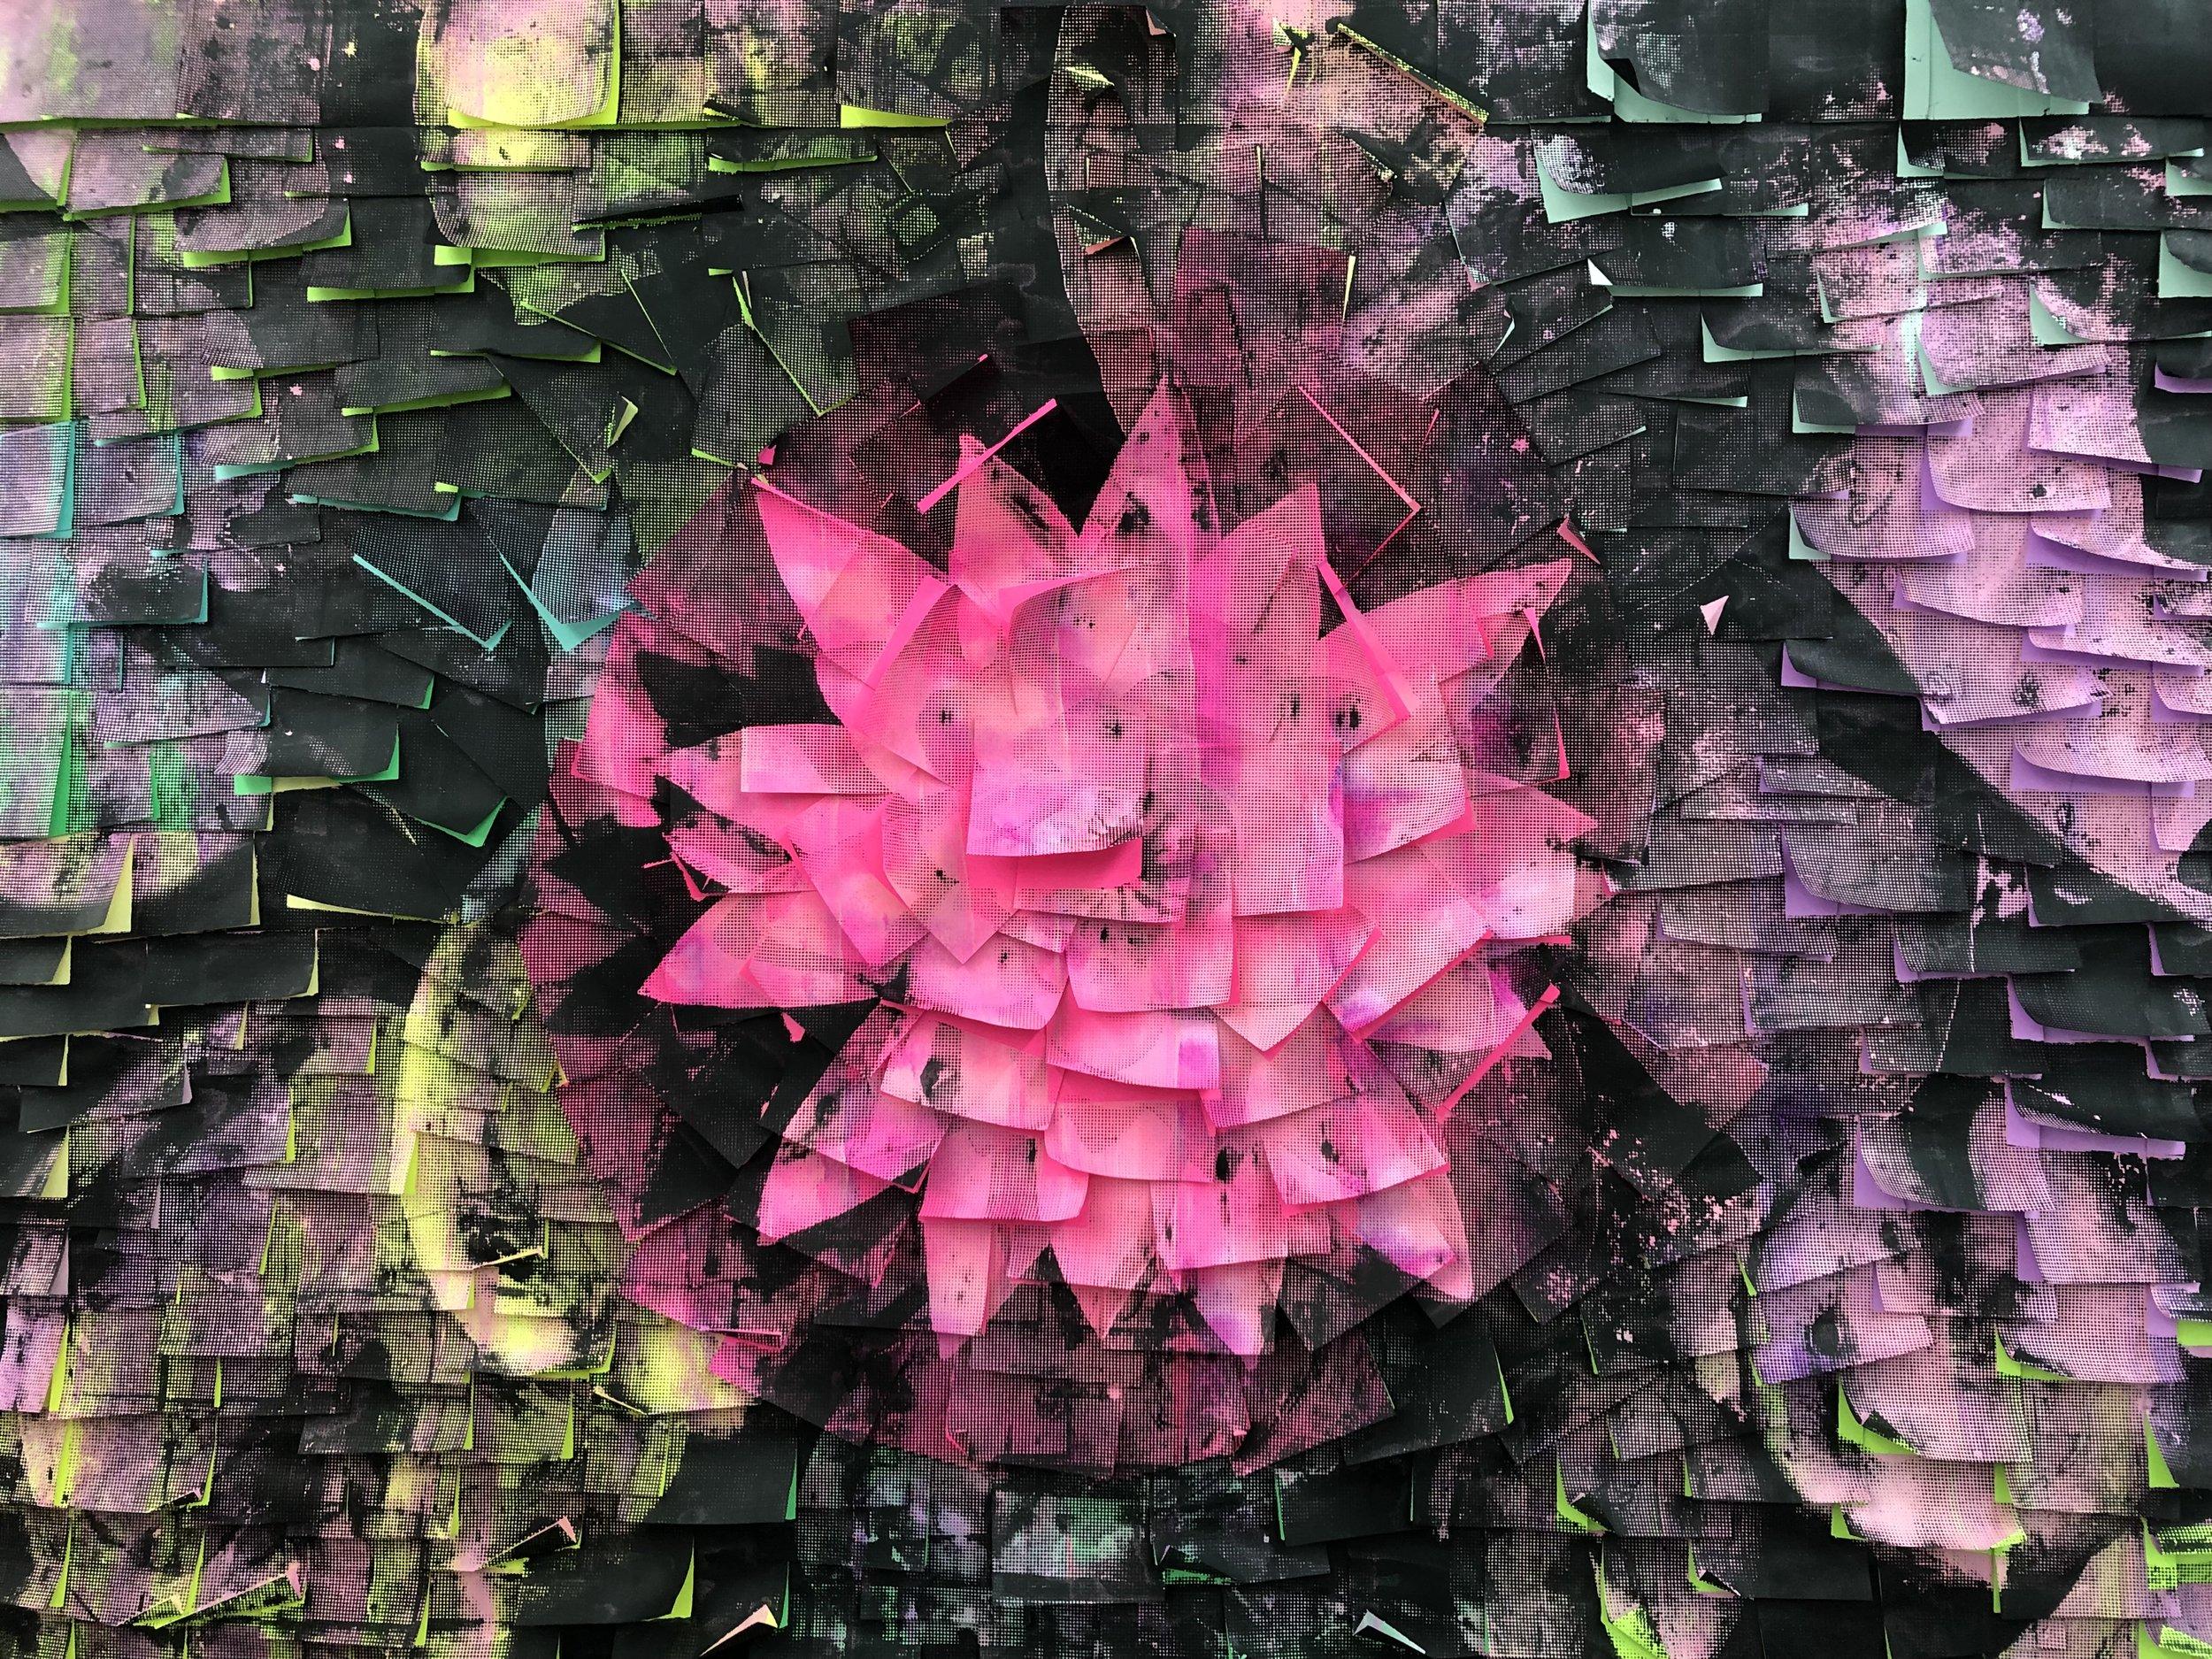 Anna Laudel Gallery, Ardan Özmenoglu, Allien, 2019, Painting and silk screen printing on post-it notes, 31.5x42in.jpg